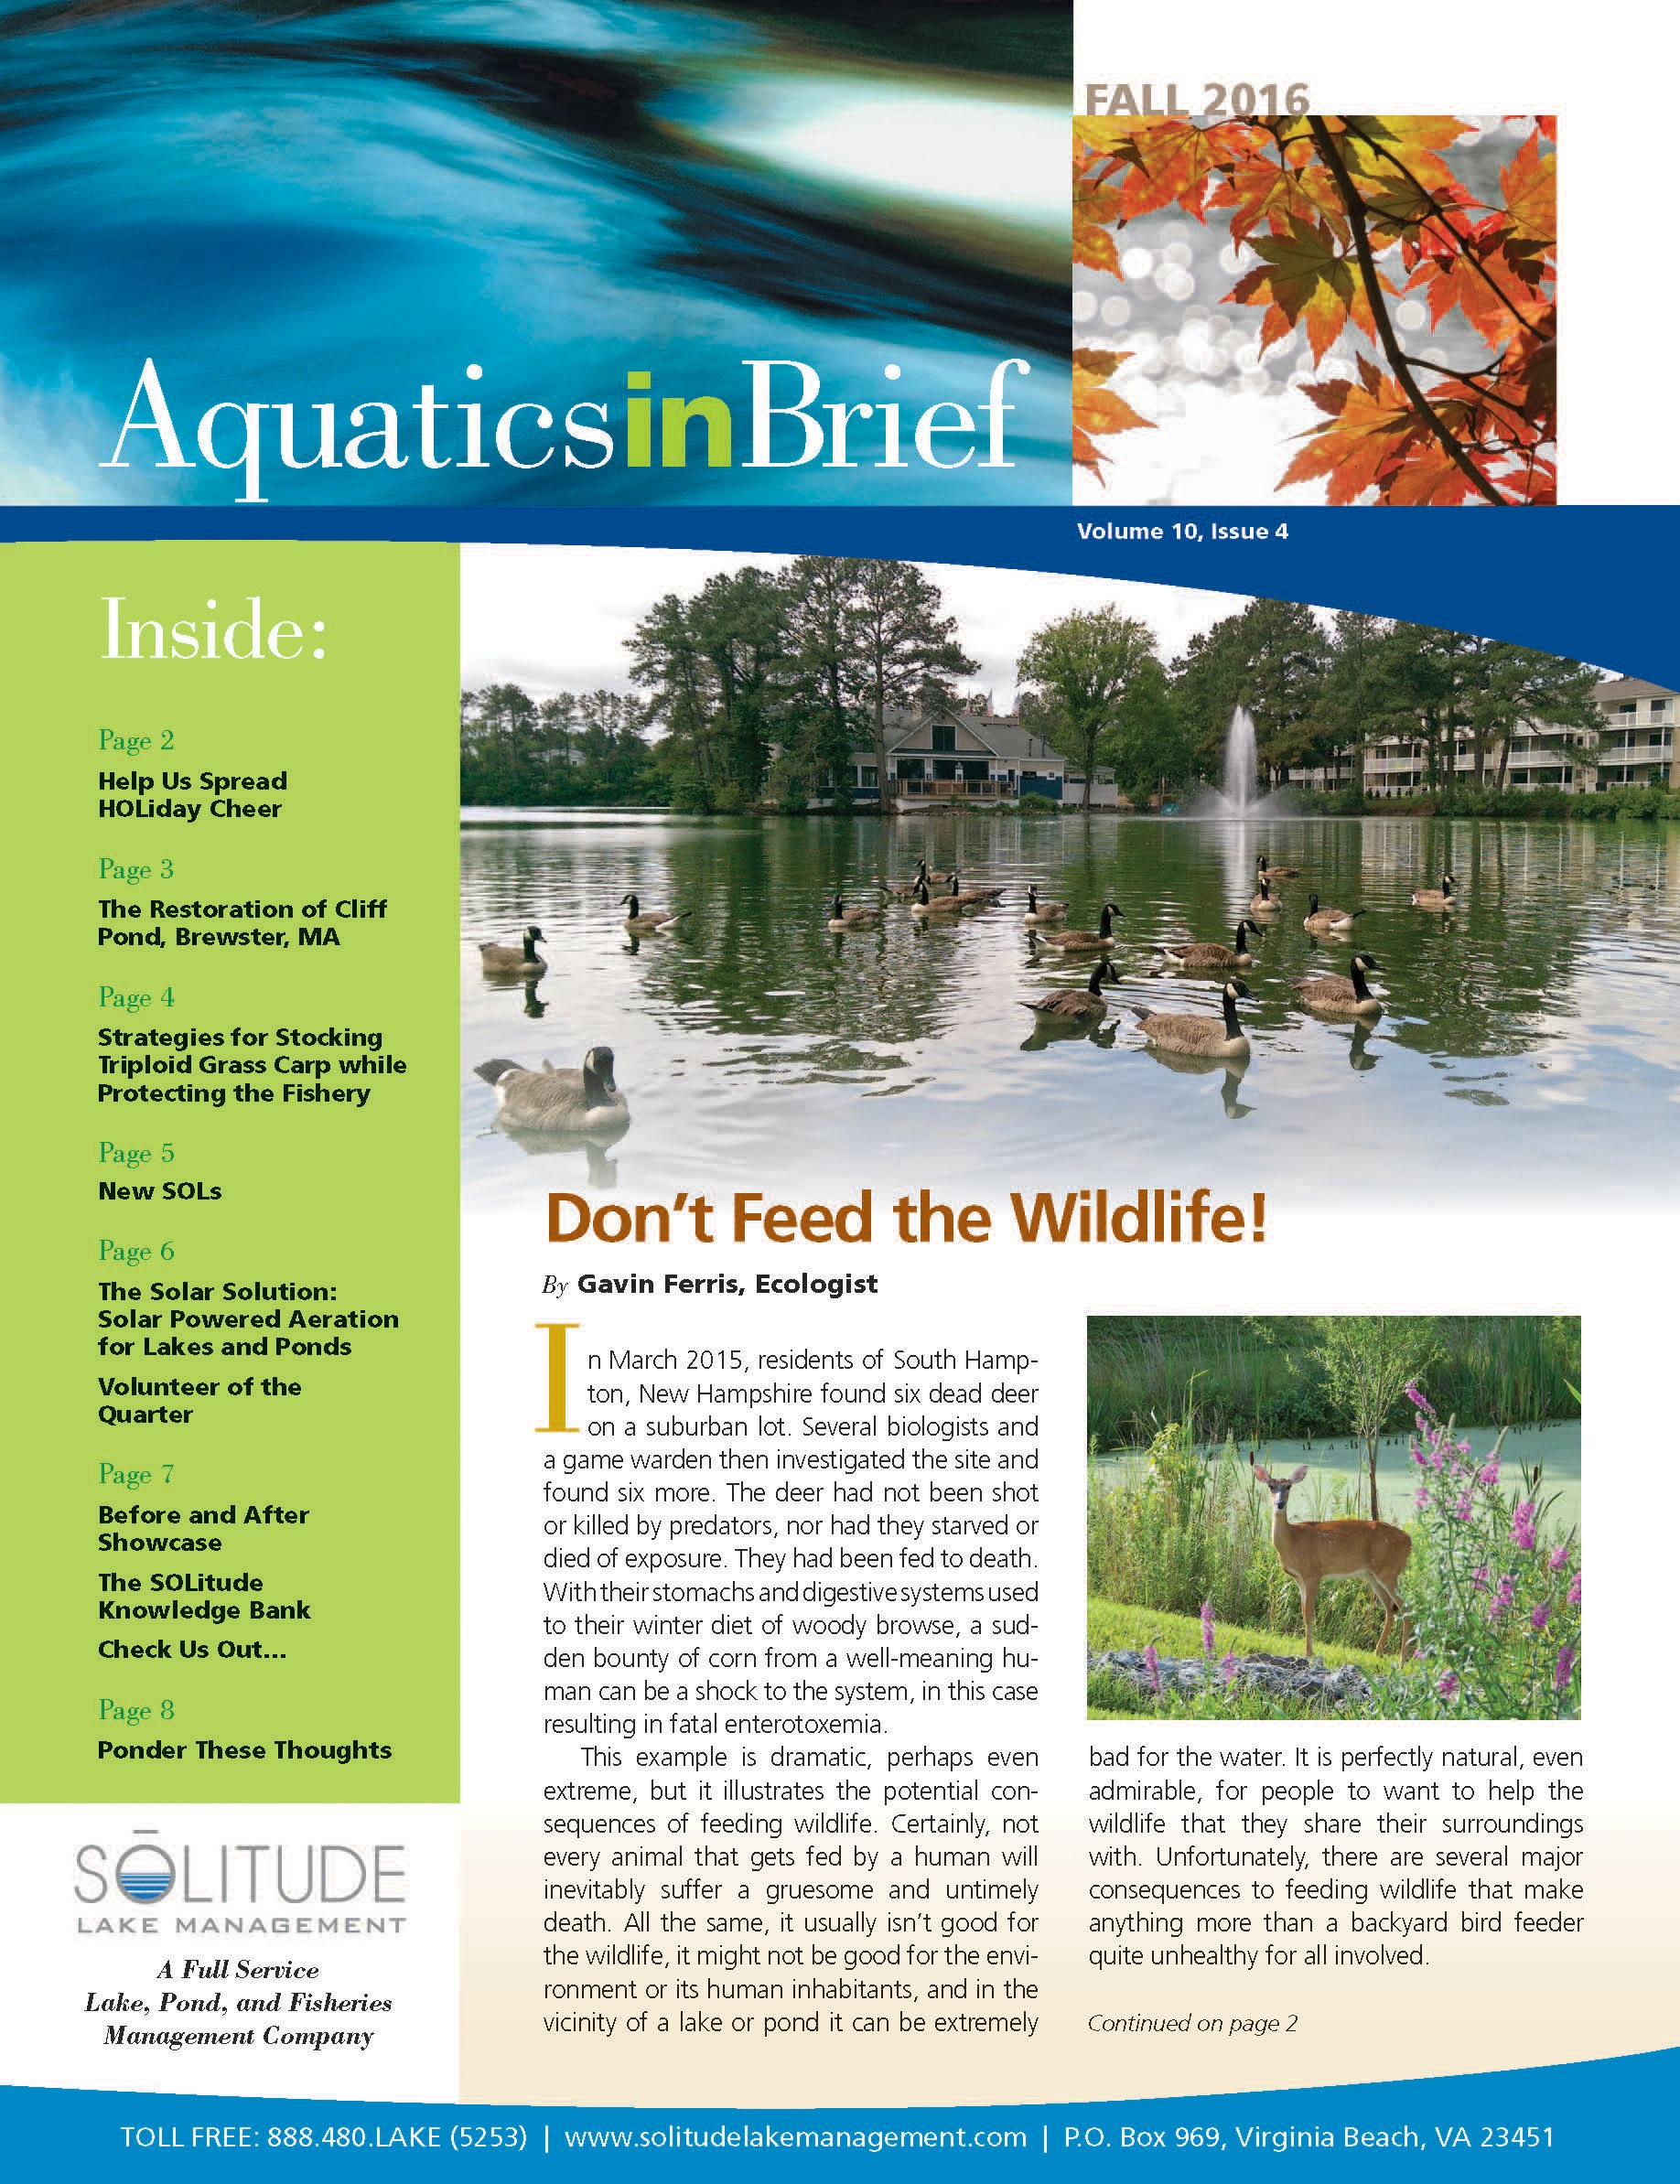 AquaticsInBrief_newsletter_10.2016_fall_cover